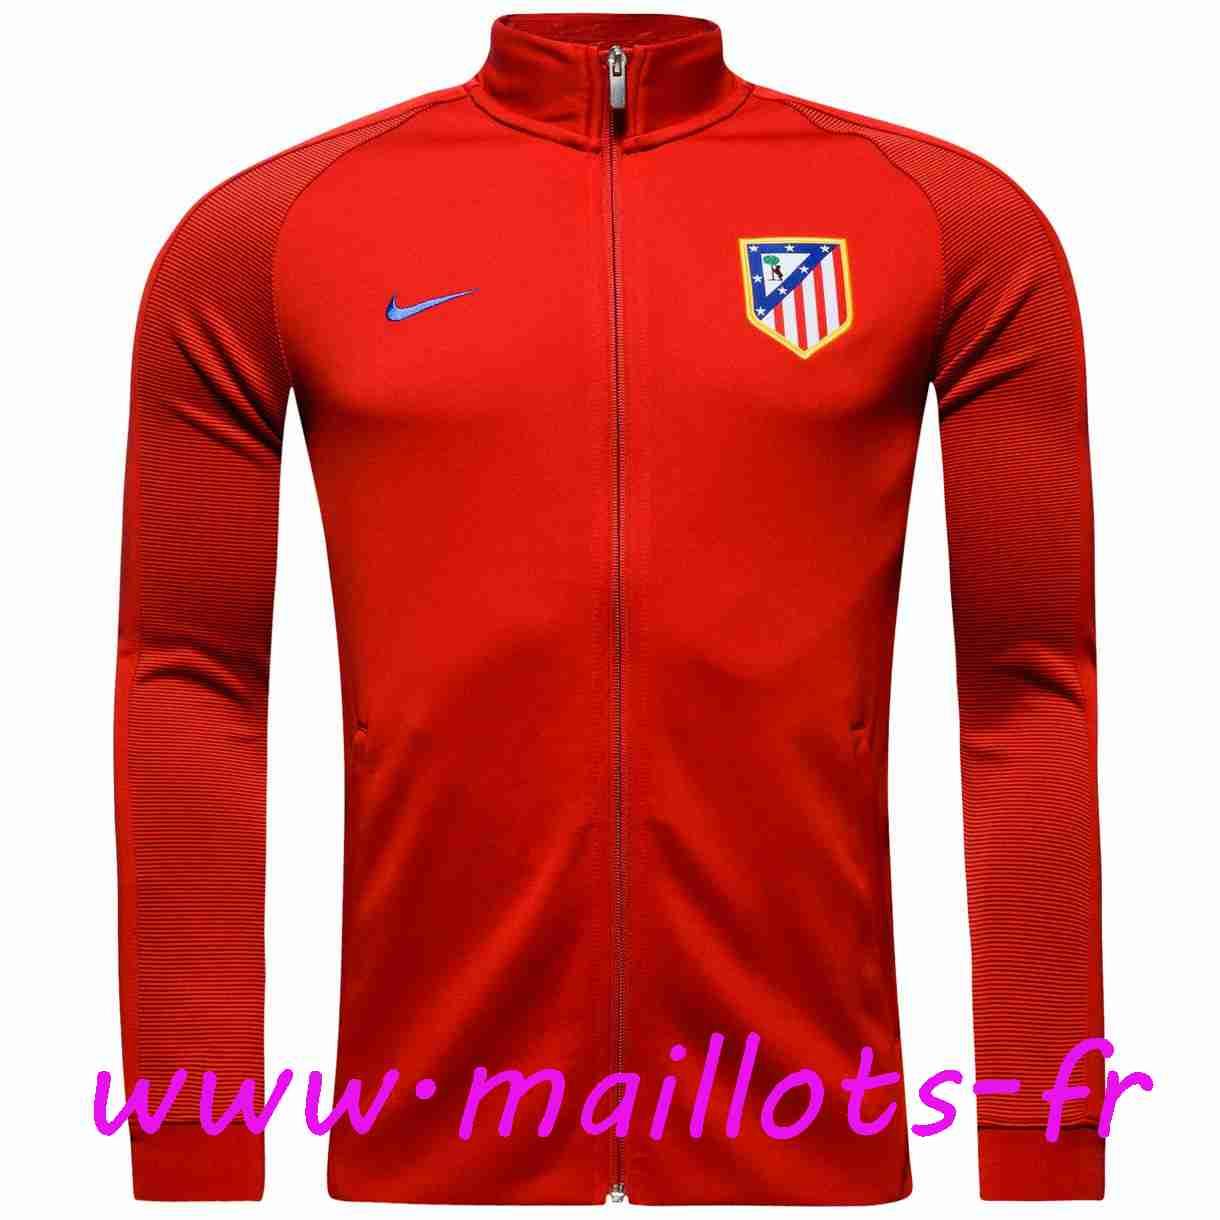 ensemble de foot Atlético de Madrid Vestes